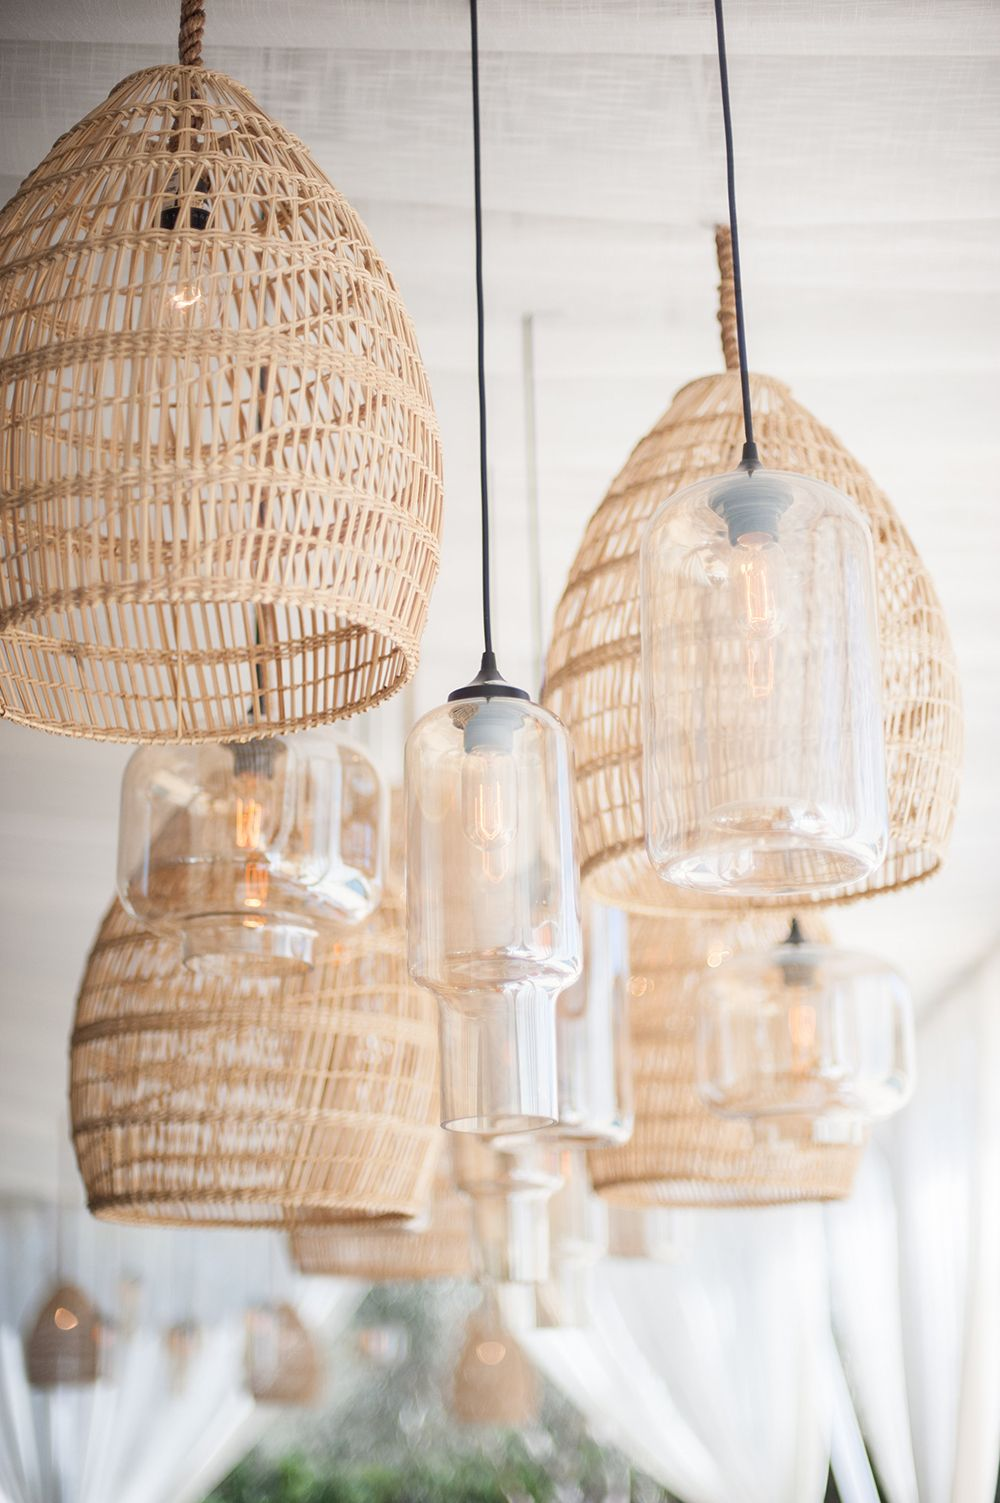 450 coastal lighting ideas in 2021